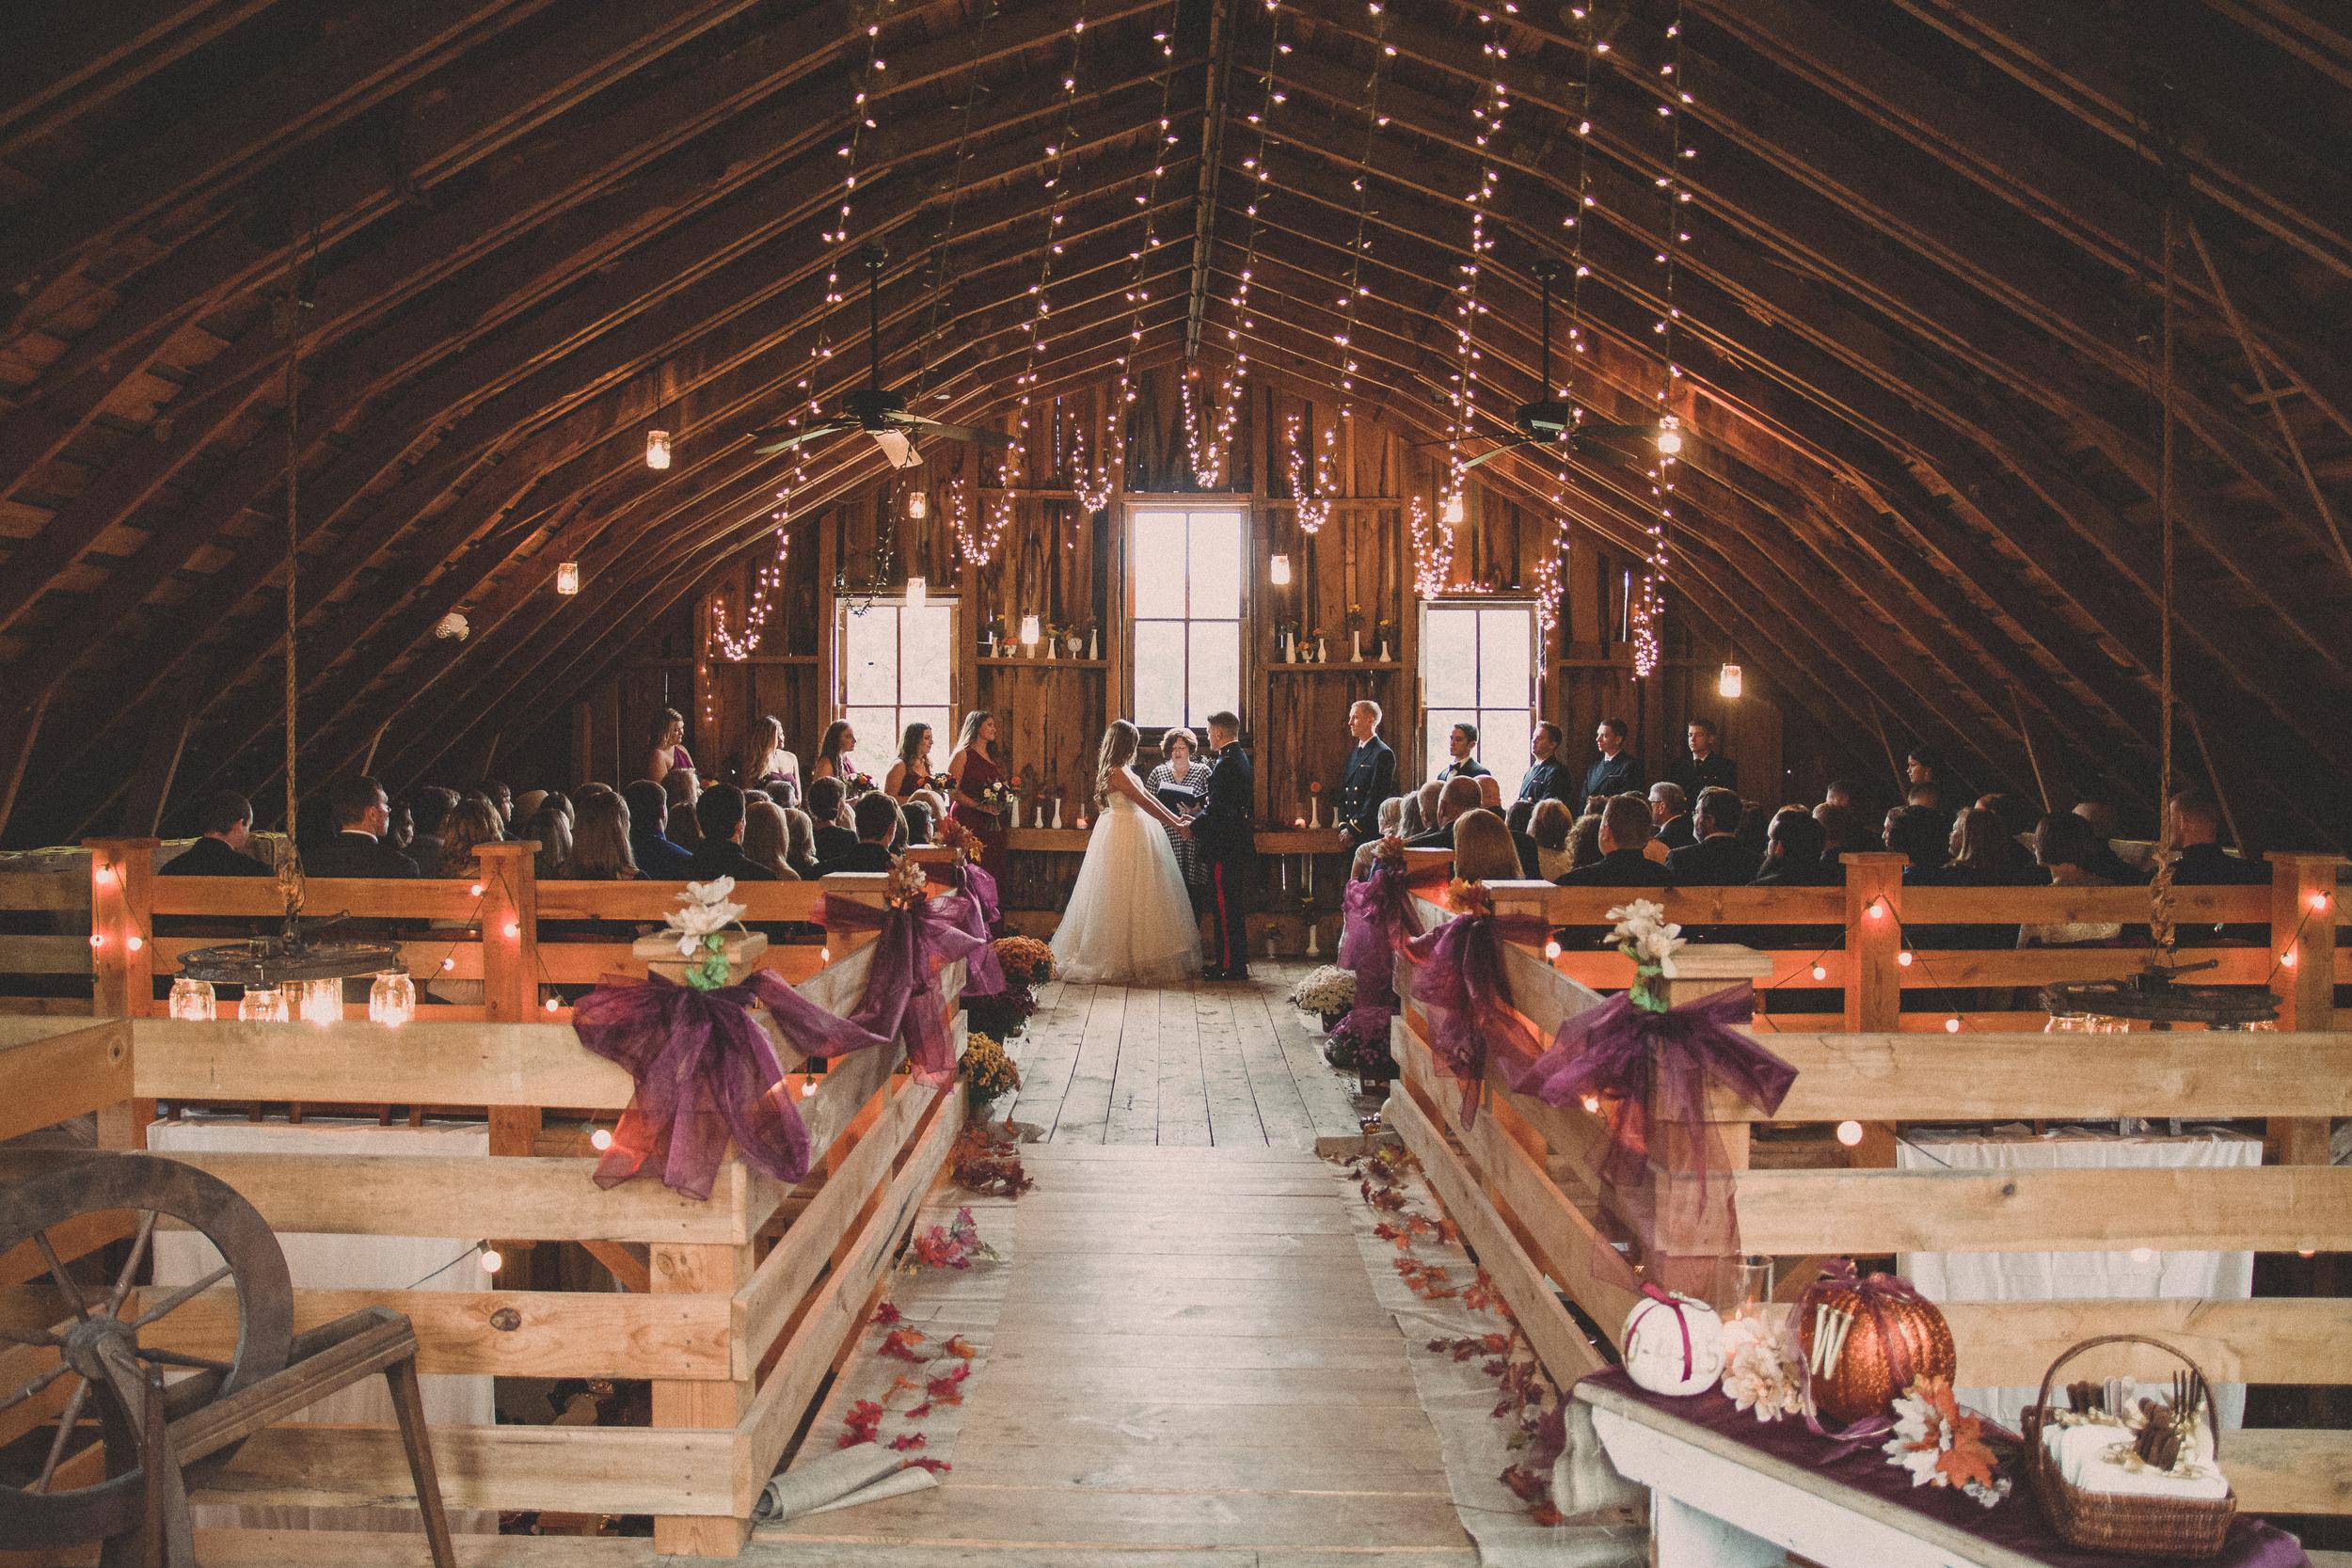 The Glasgow Farm Wedding rustic fall ceremony Photo